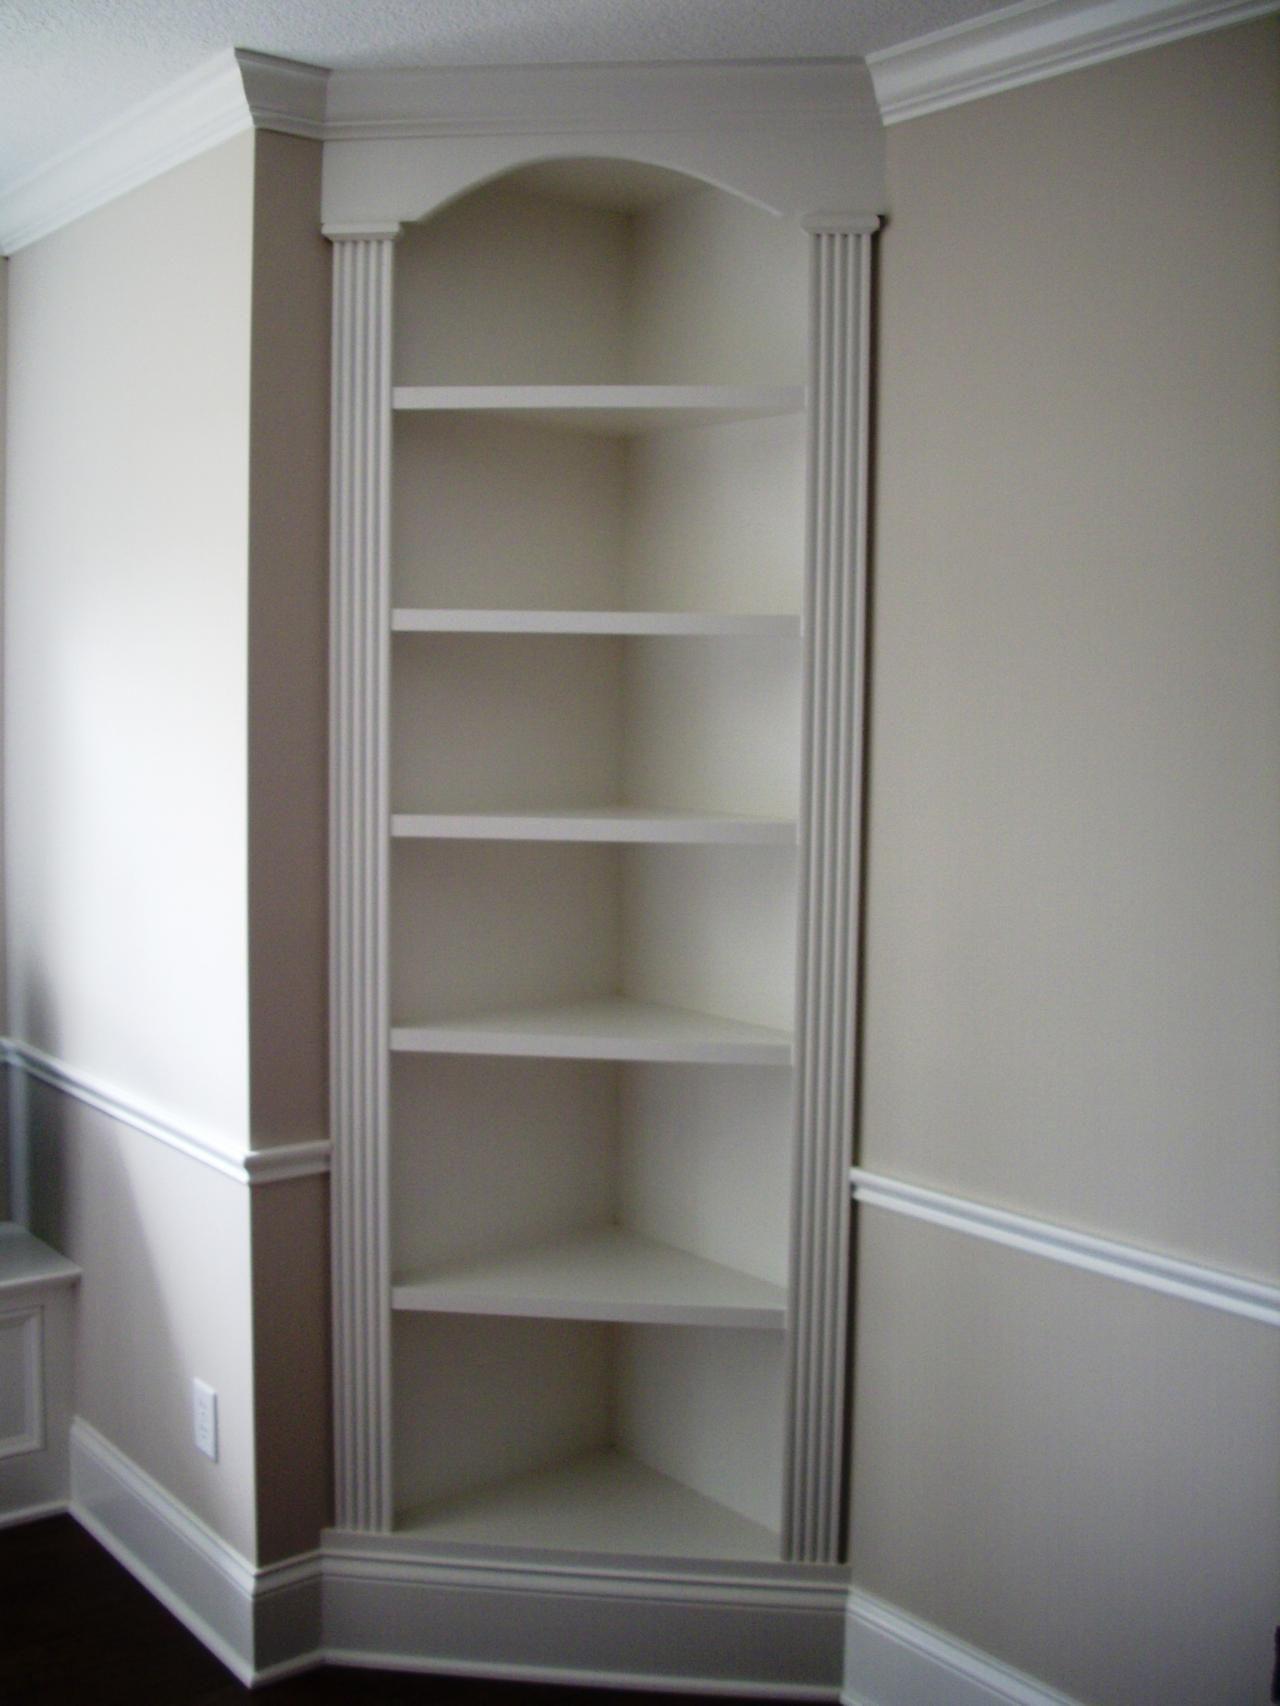 Corners Tend To Be Dead Spaces So I M A Big Fan Of Corner Cabinets Curios Plant Stands Anything Th Muebles De Esquina Bricolaje Para El Hogar Muebles Hogar